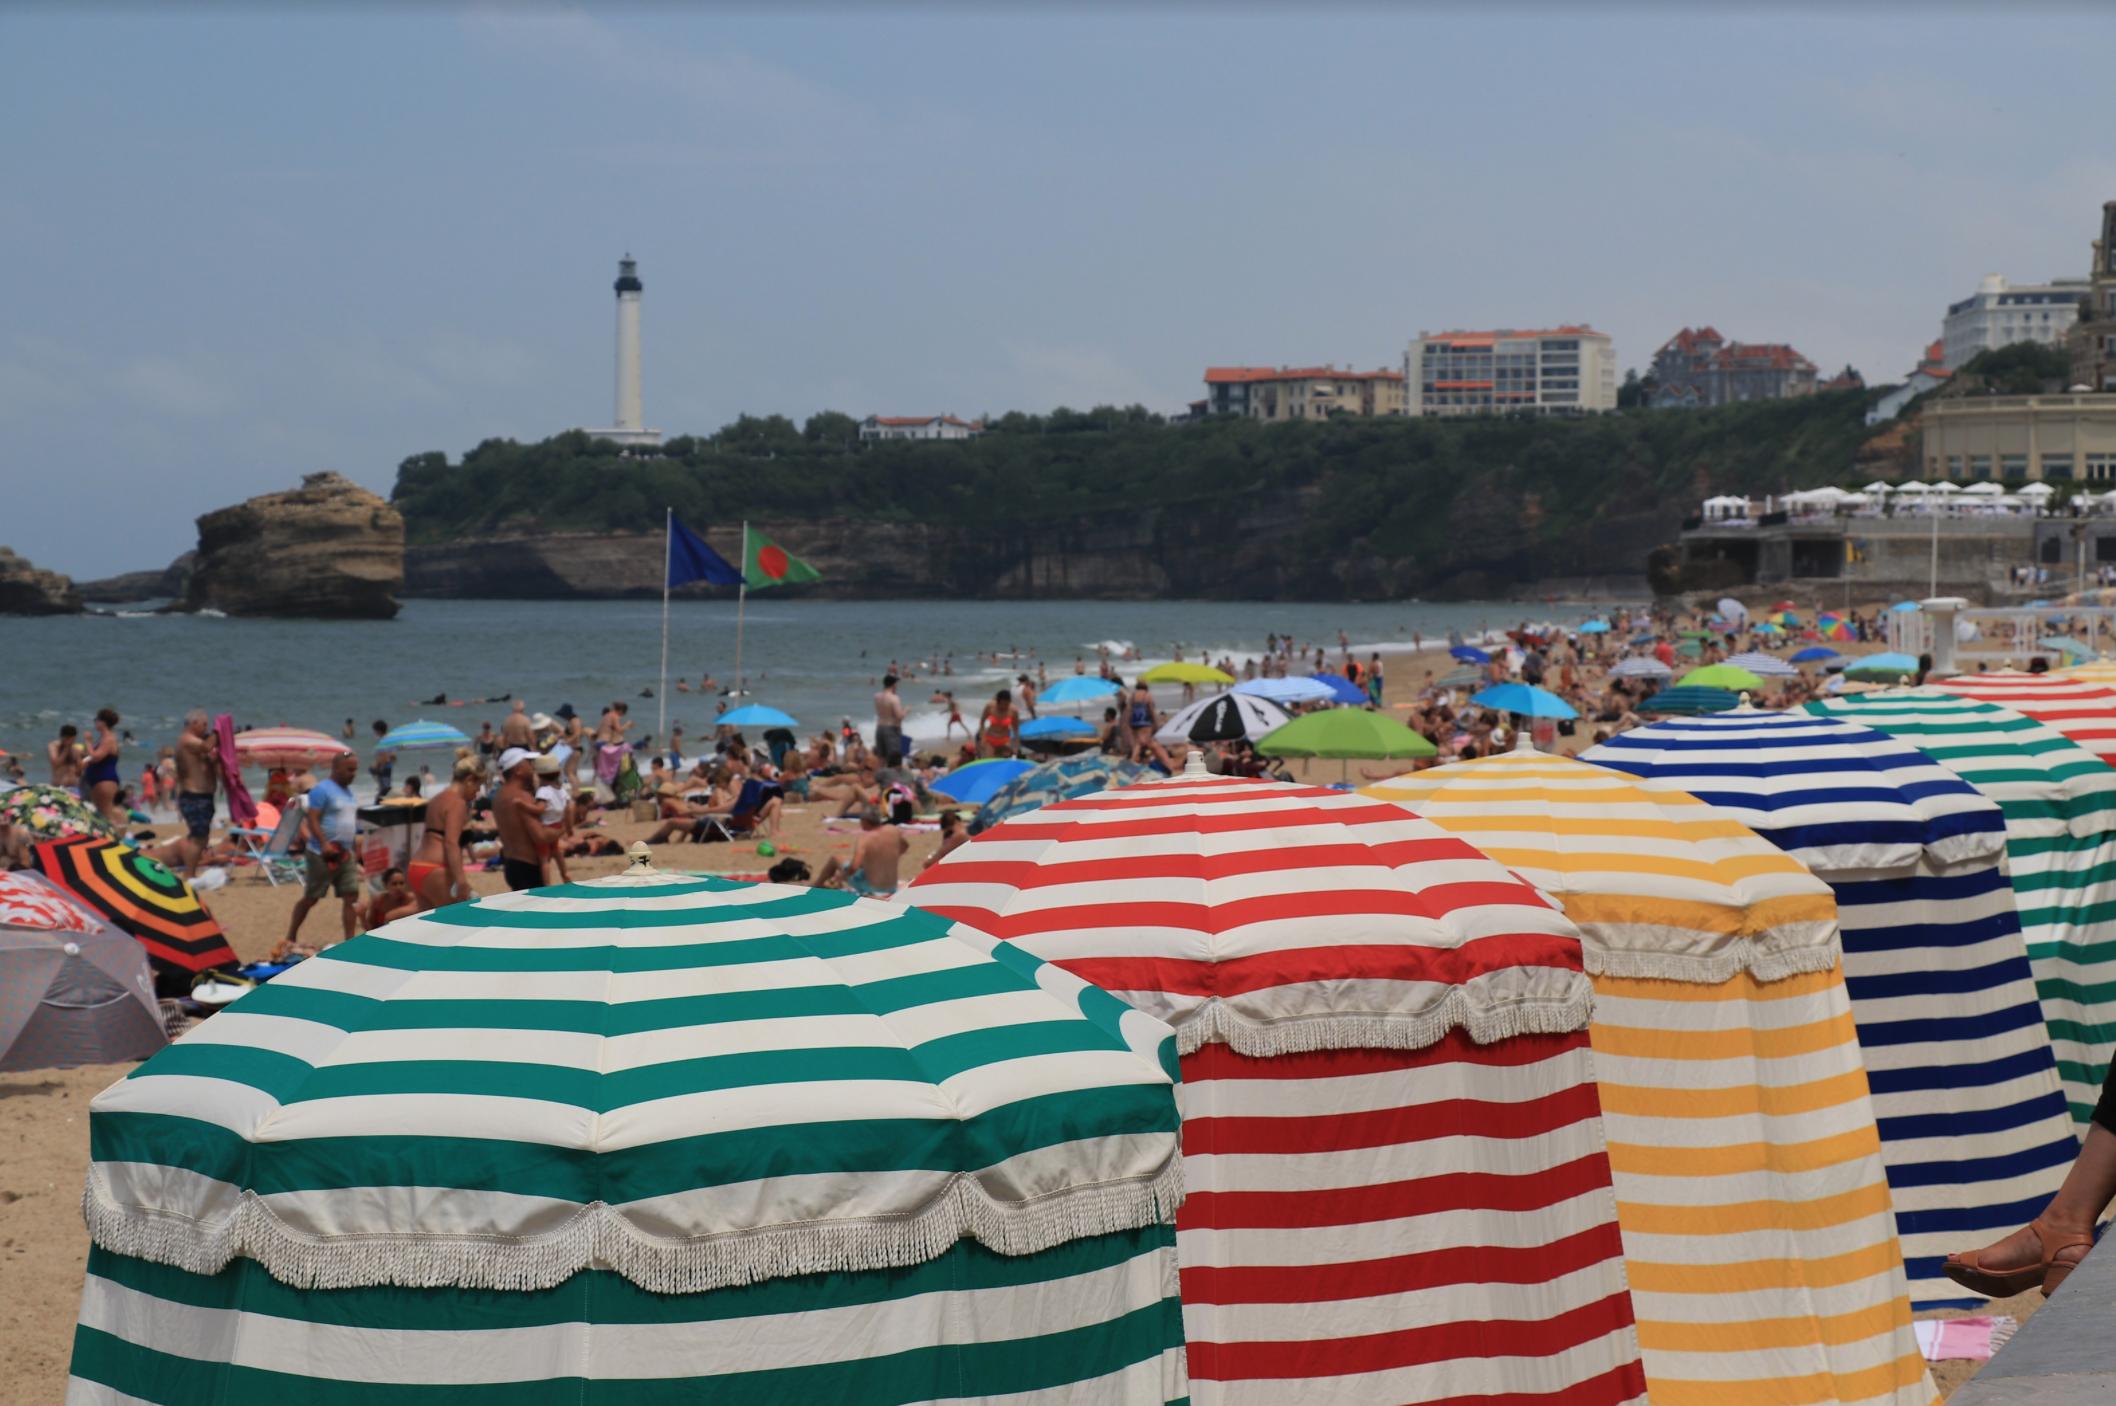 70s beach palette in Biarritz France